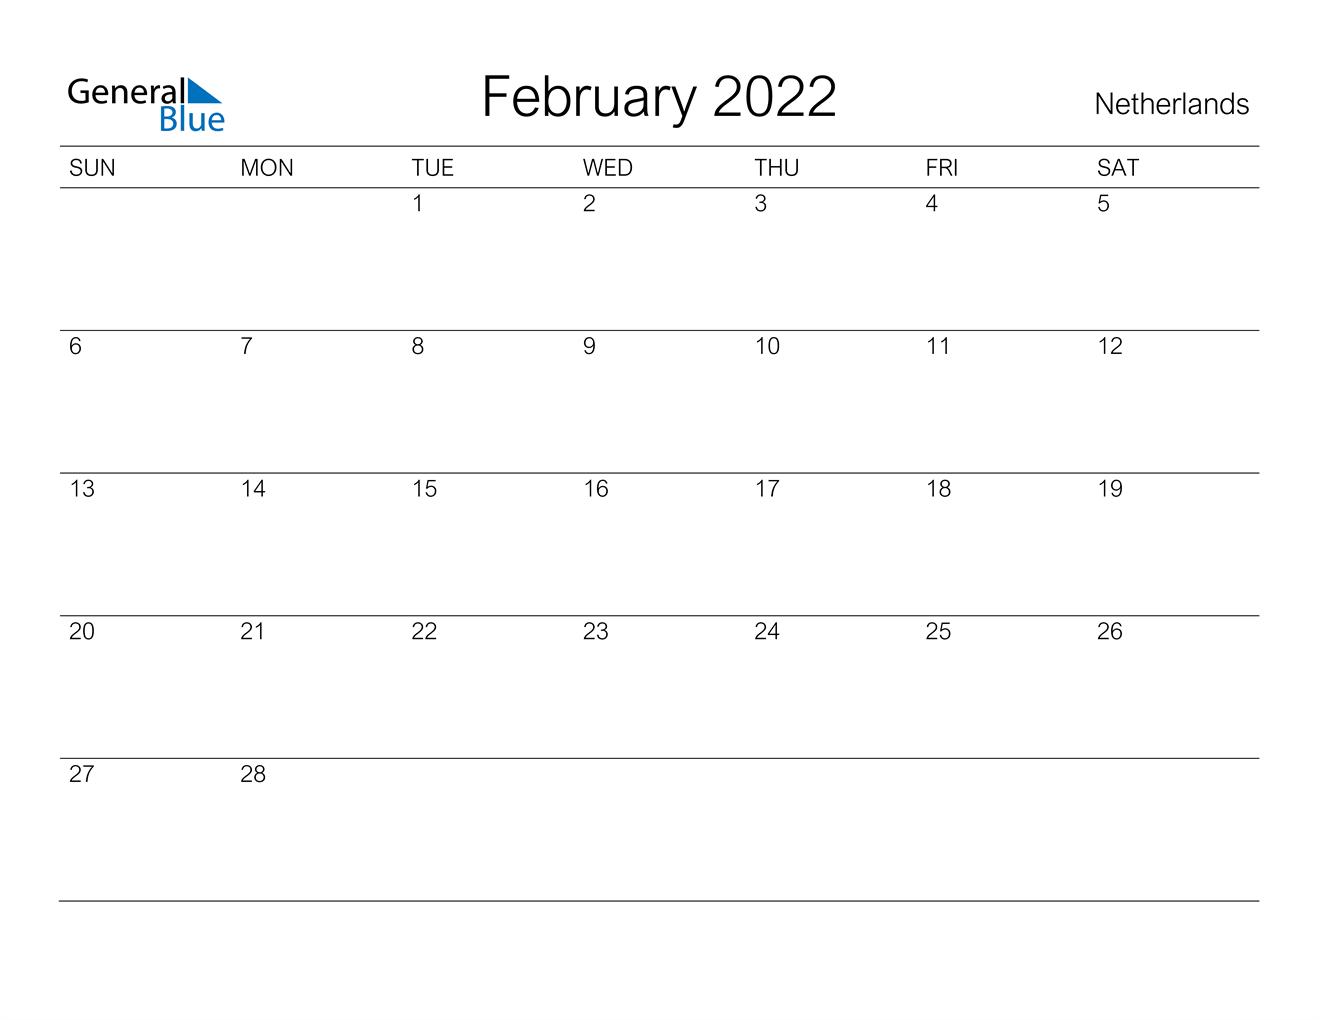 February 2022 Calendar - Netherlands